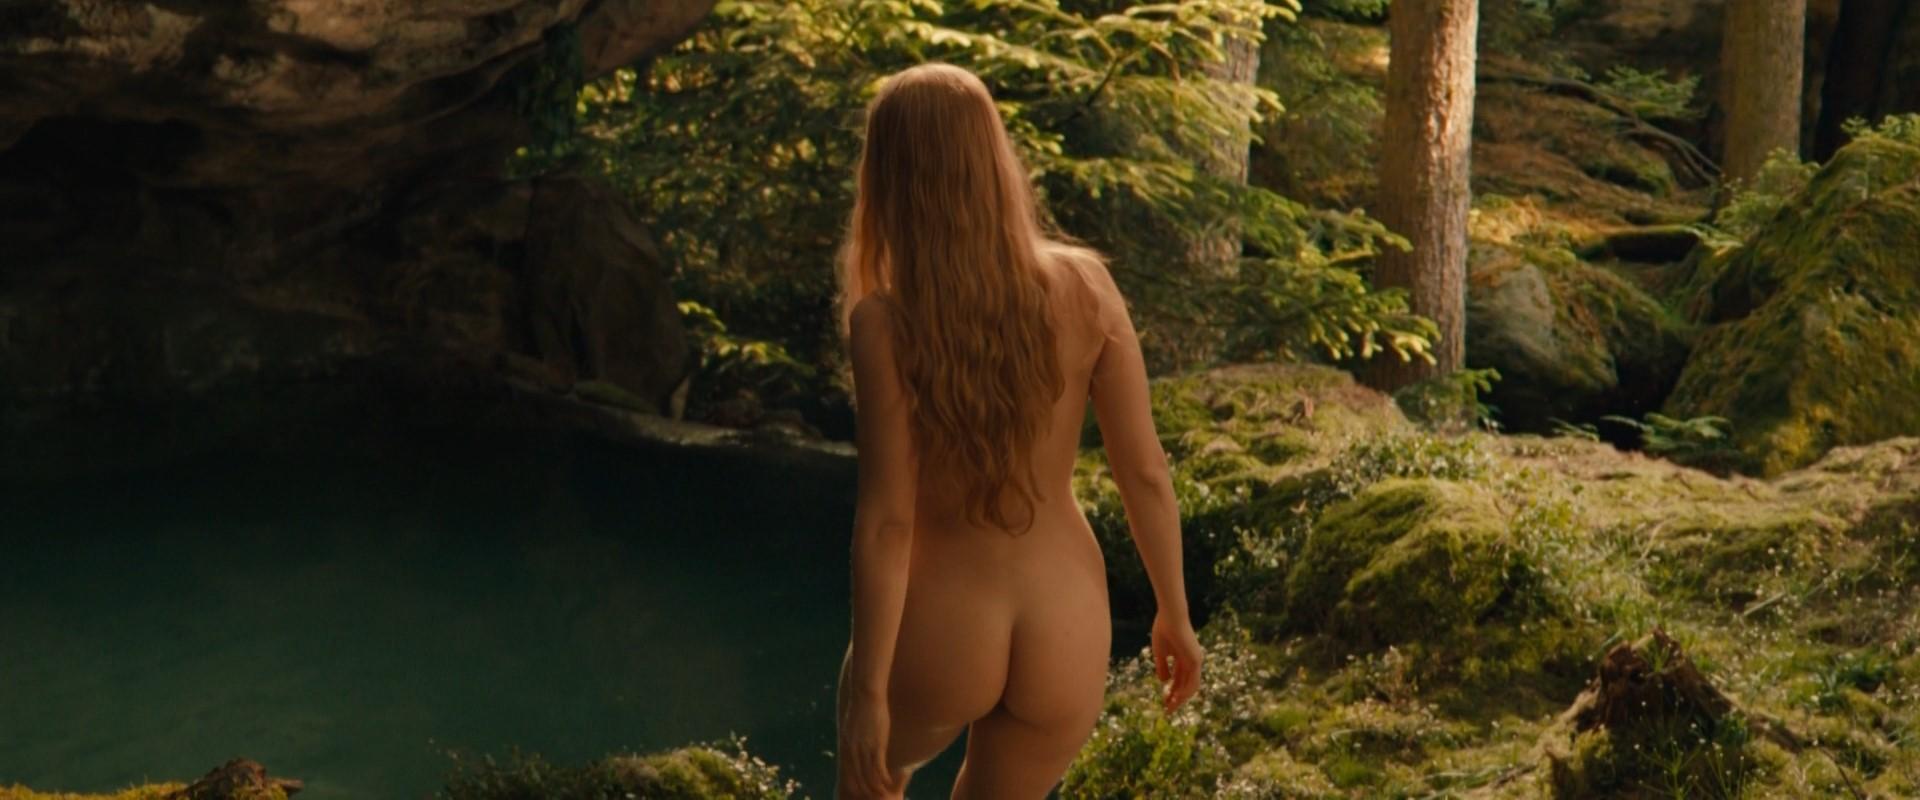 Britne Oldford Nude watch online - britne oldford – hunters s01e01 (2016) hd 1080p